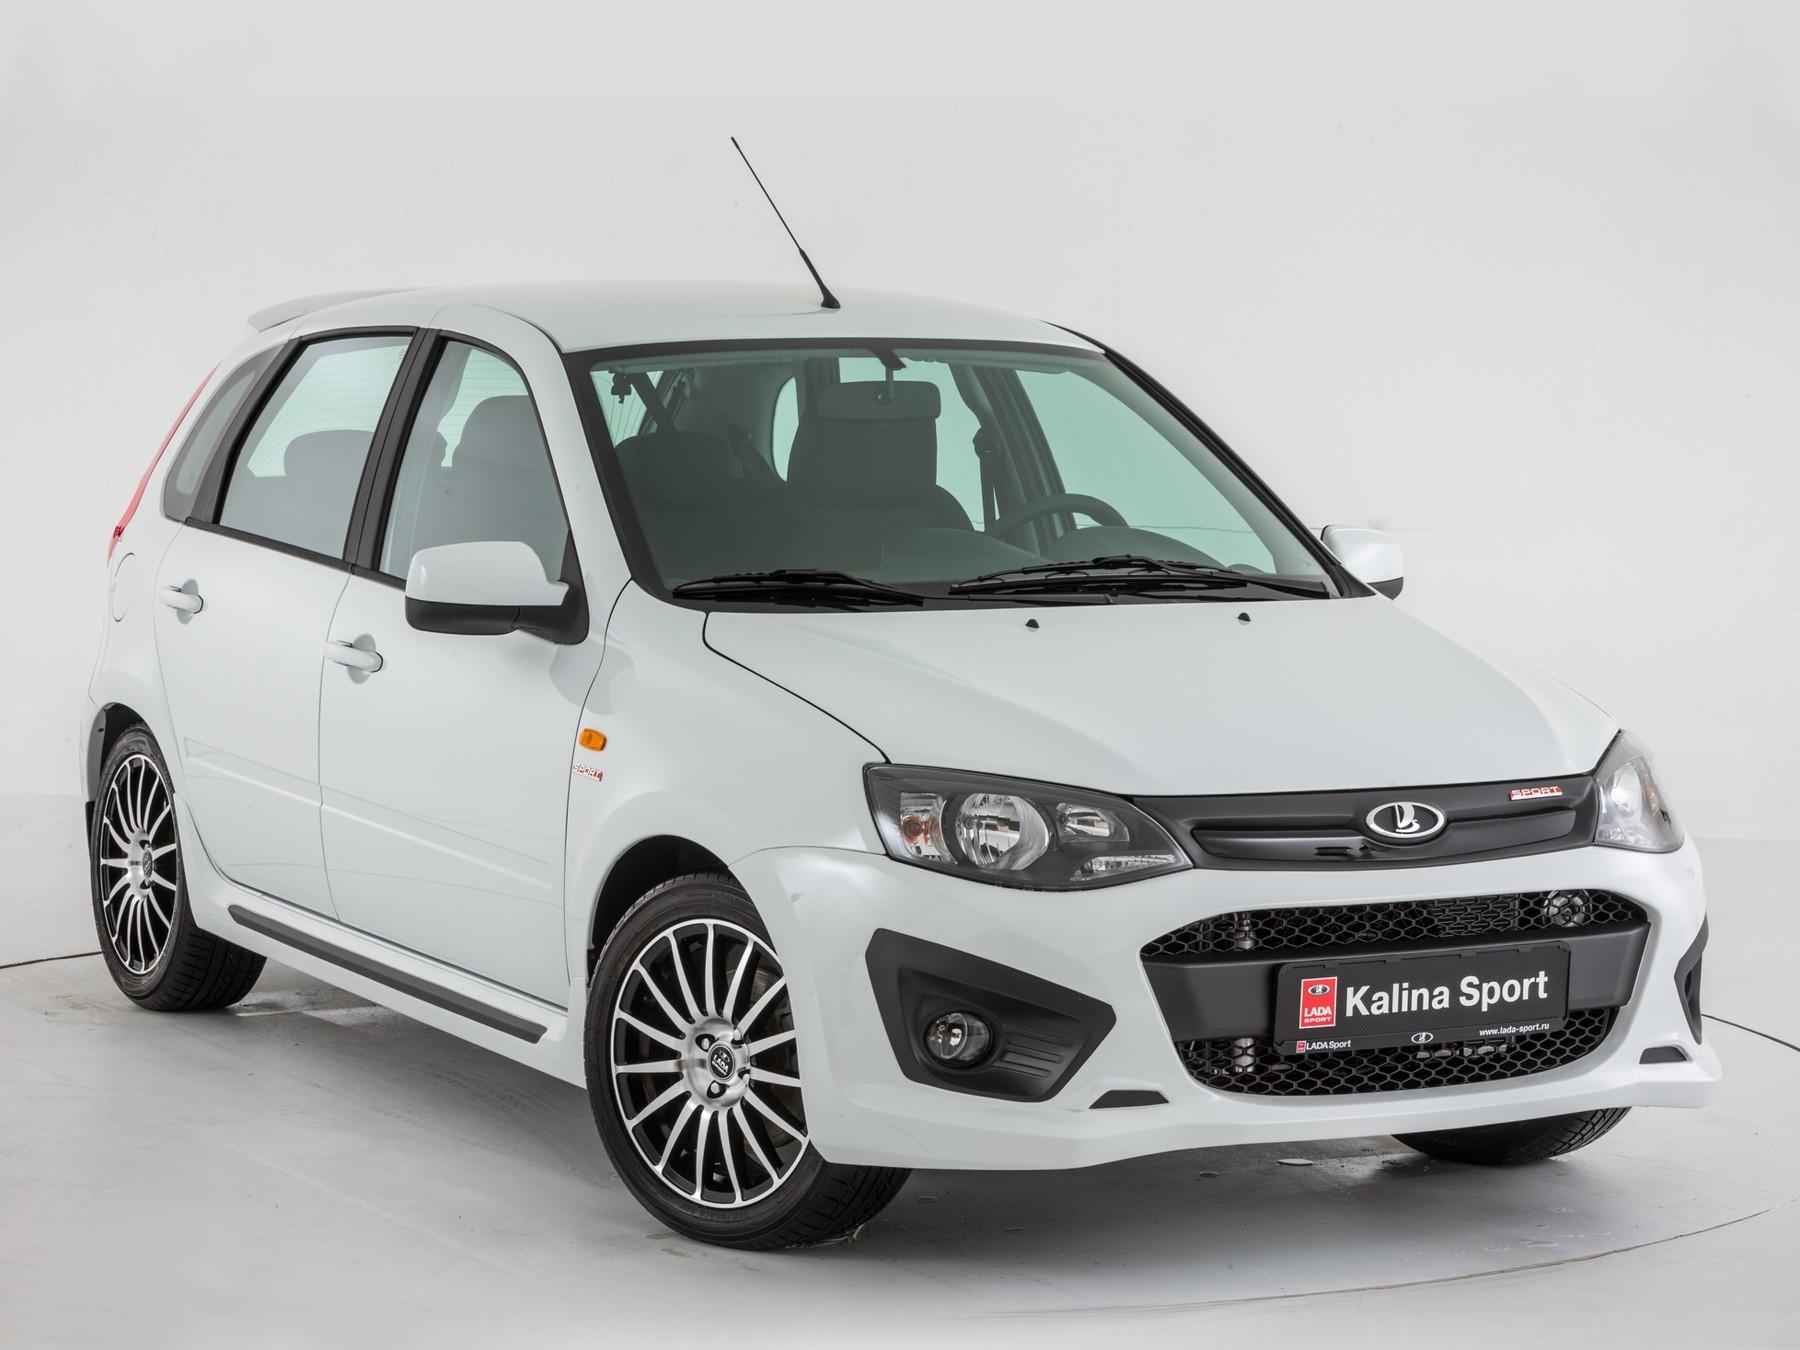 Изменения в новом кузове Лада Калина Спорт в 2018 году фото